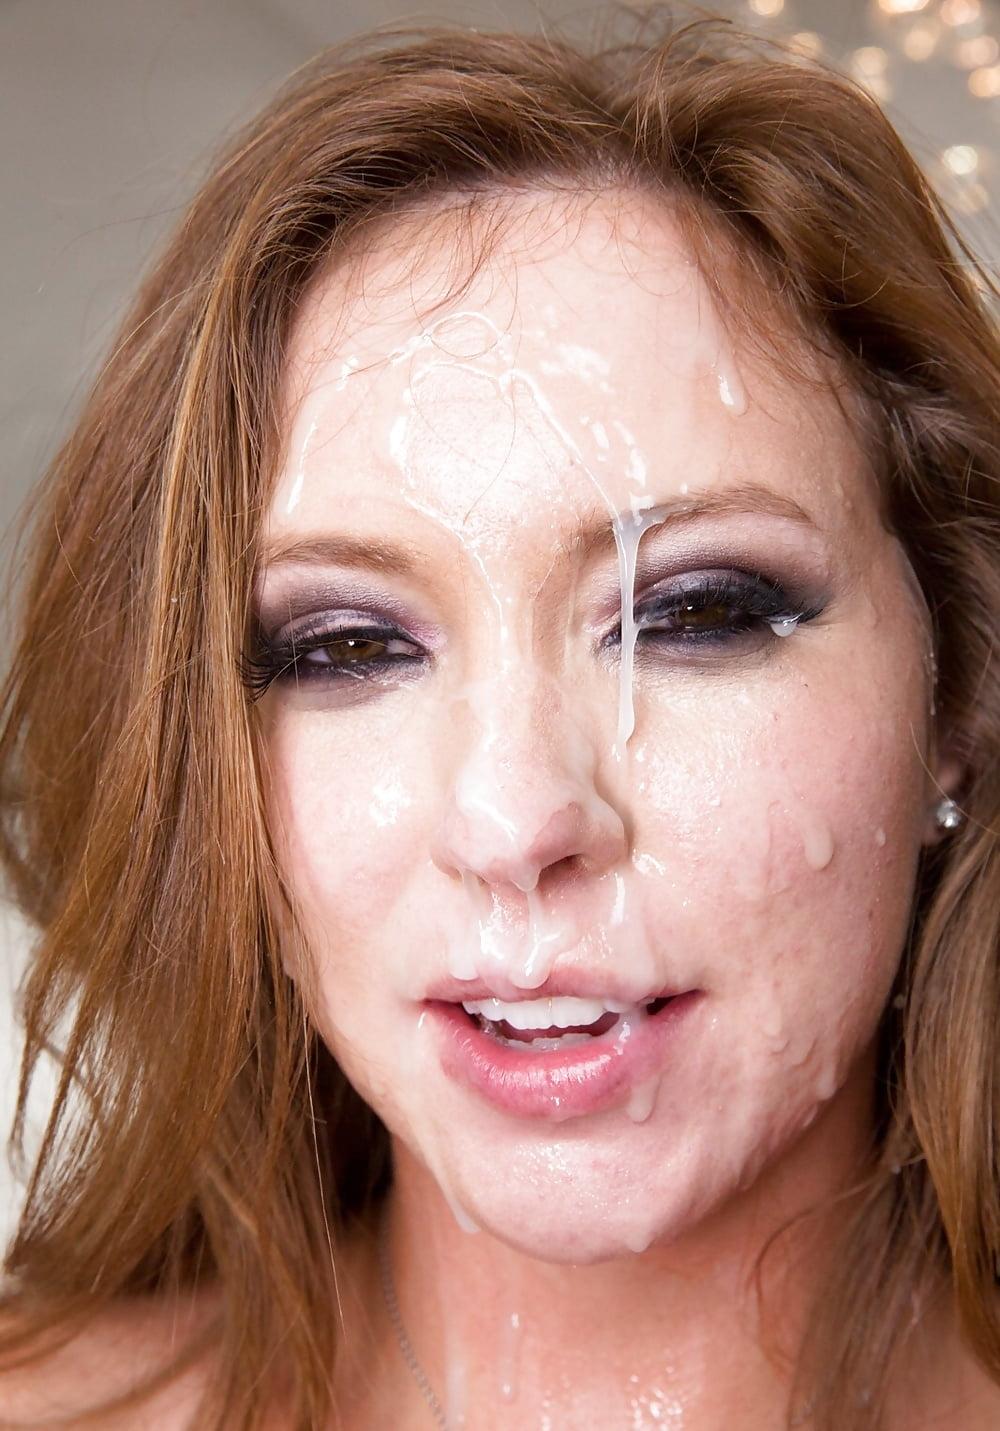 Facial porn put face on pornstar body nude